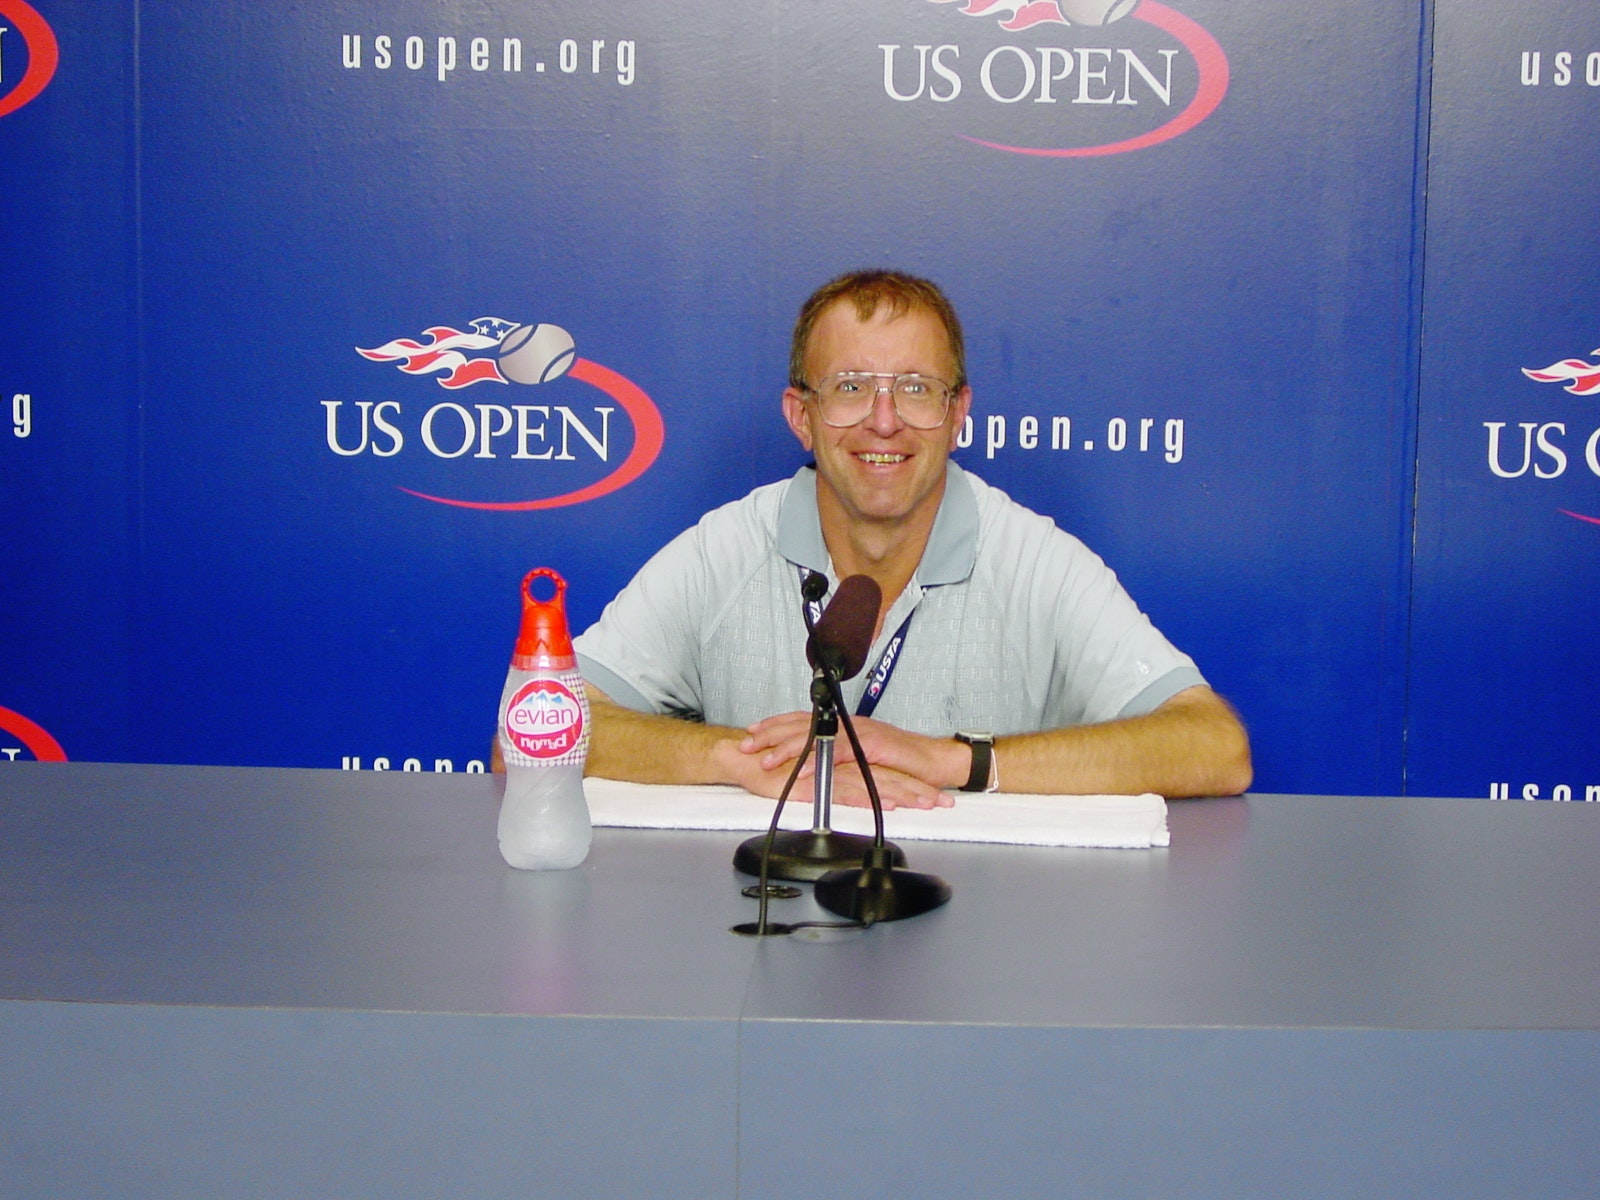 Jim B. teaches tennis lessons in Pittsburgh, PA